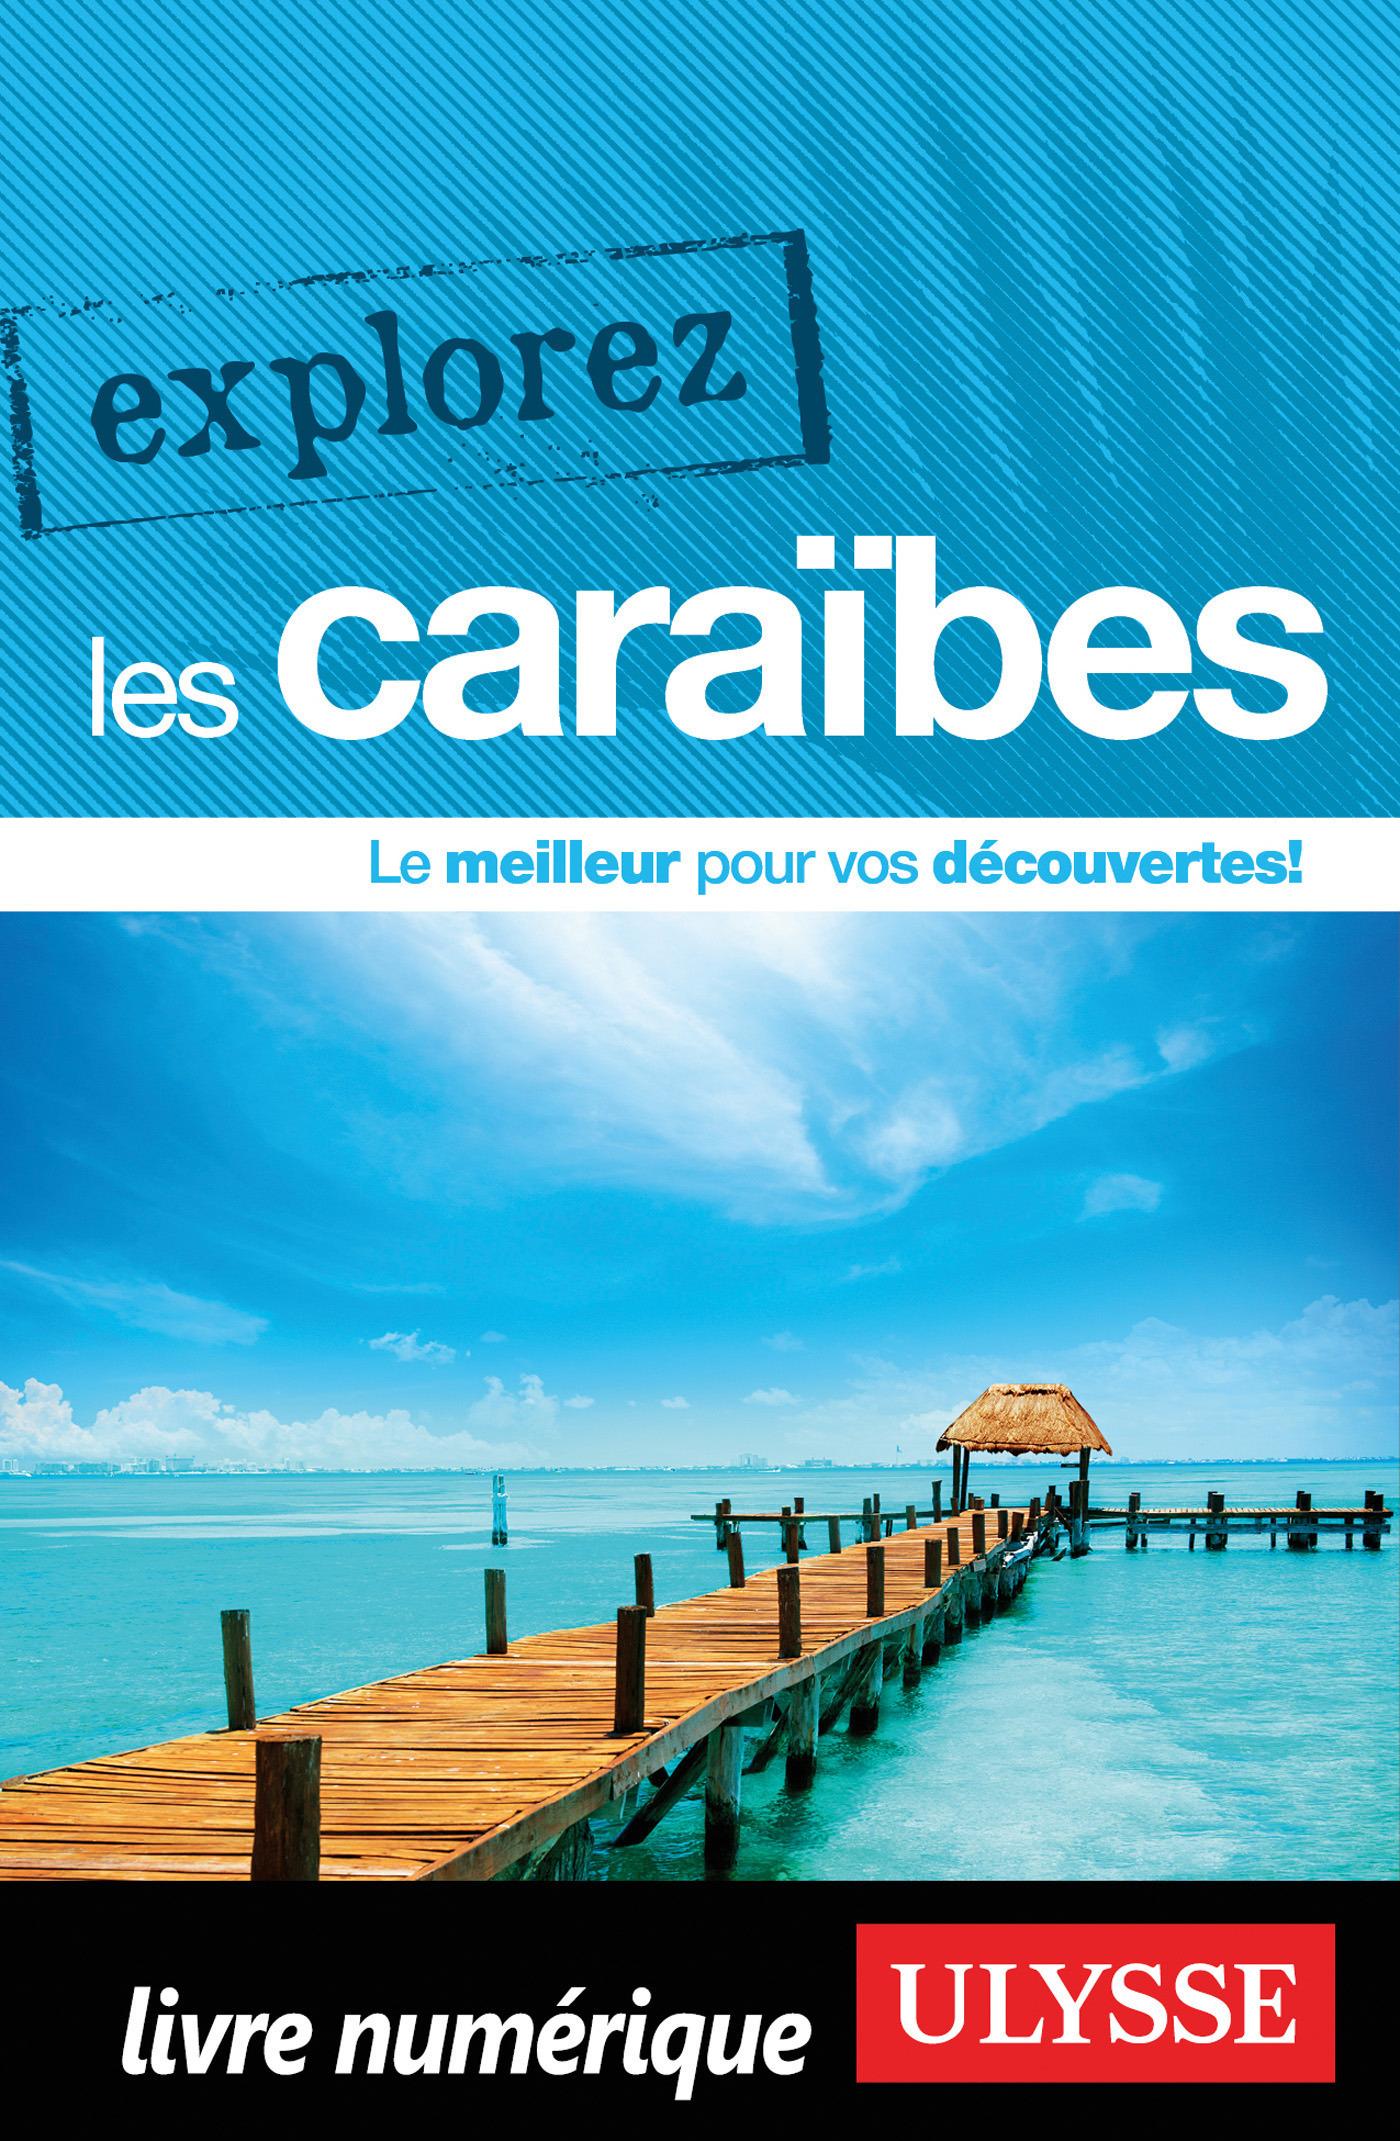 Explorez les Caraïbes (ebook)